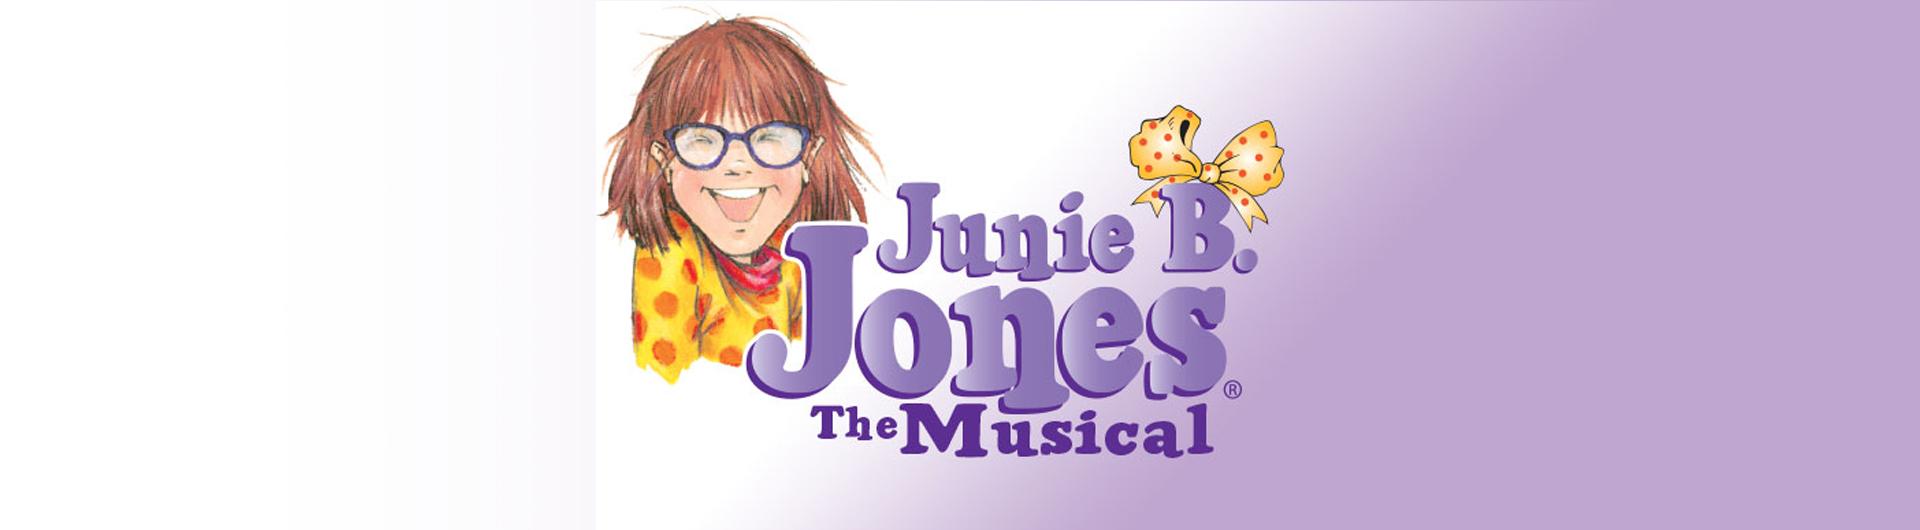 Junie B. Jones: The Musical